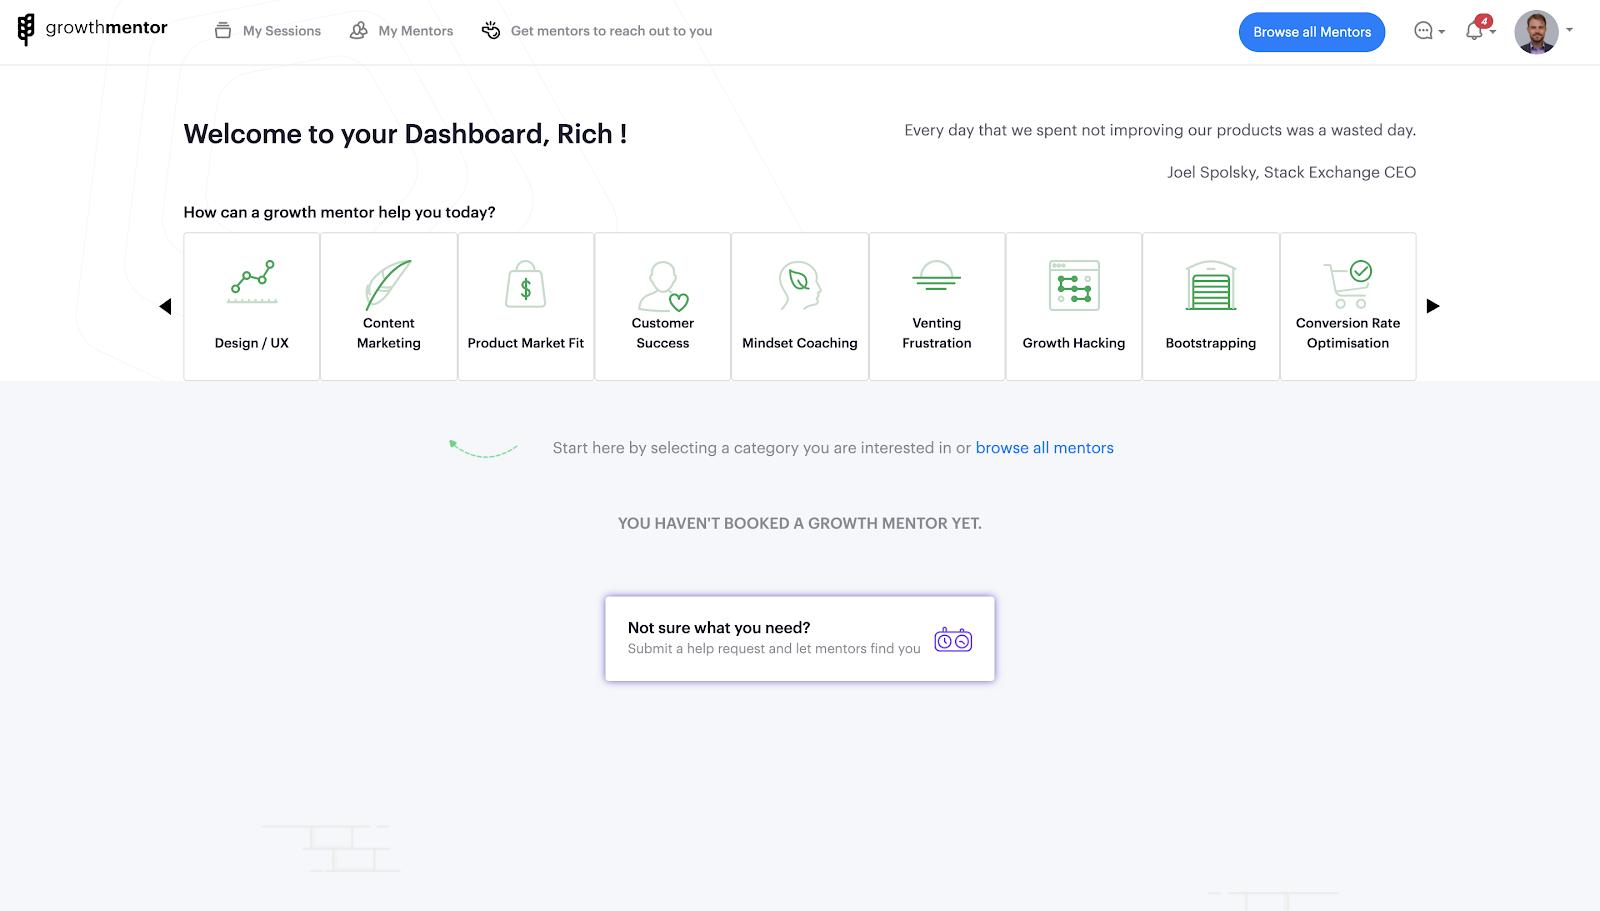 GrowthMentor's dashboard